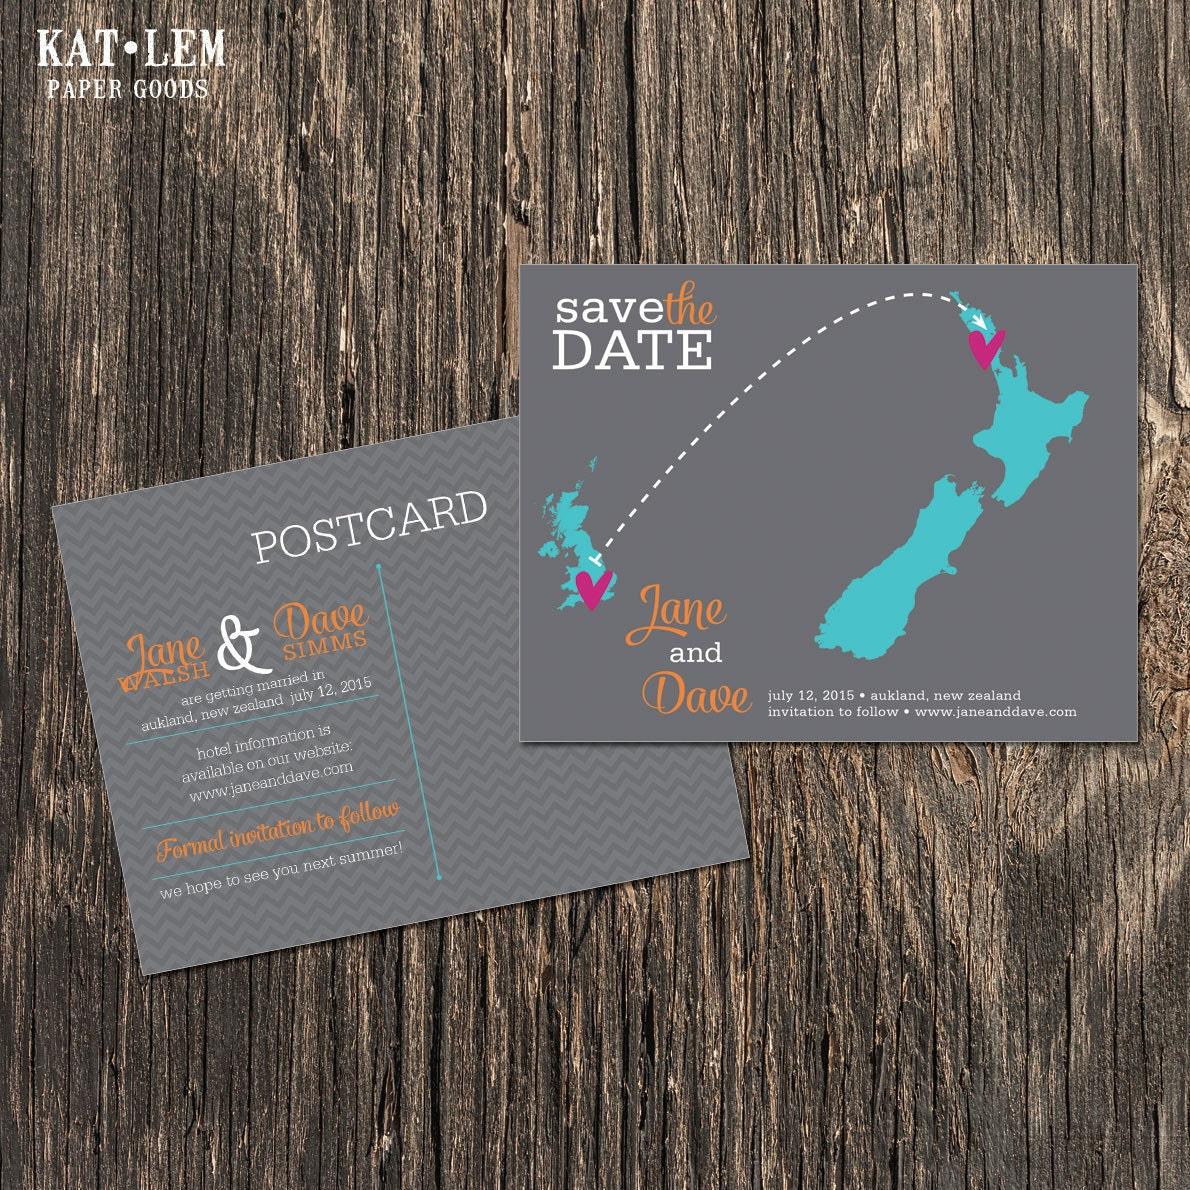 New Zealand Wedding Save The Date Destination Wedding